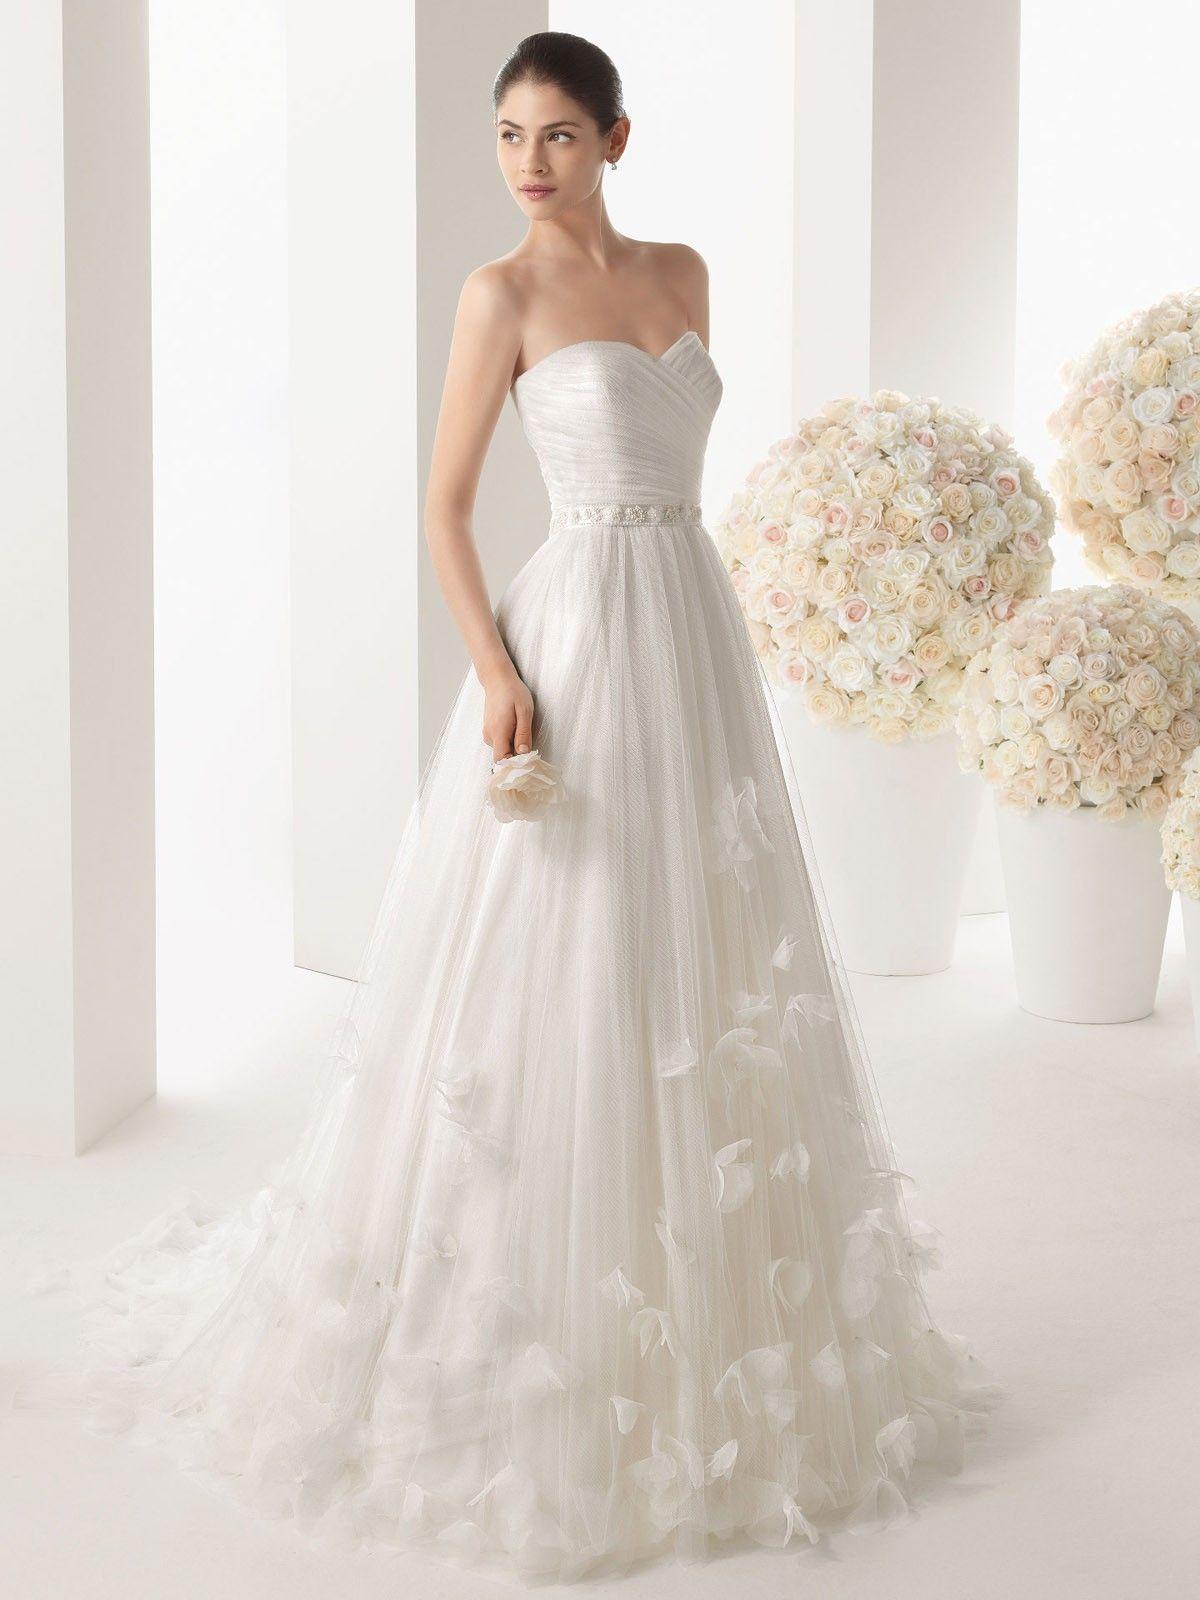 Hot summer day....light white airy dress | wedding ideas | Pinterest ...